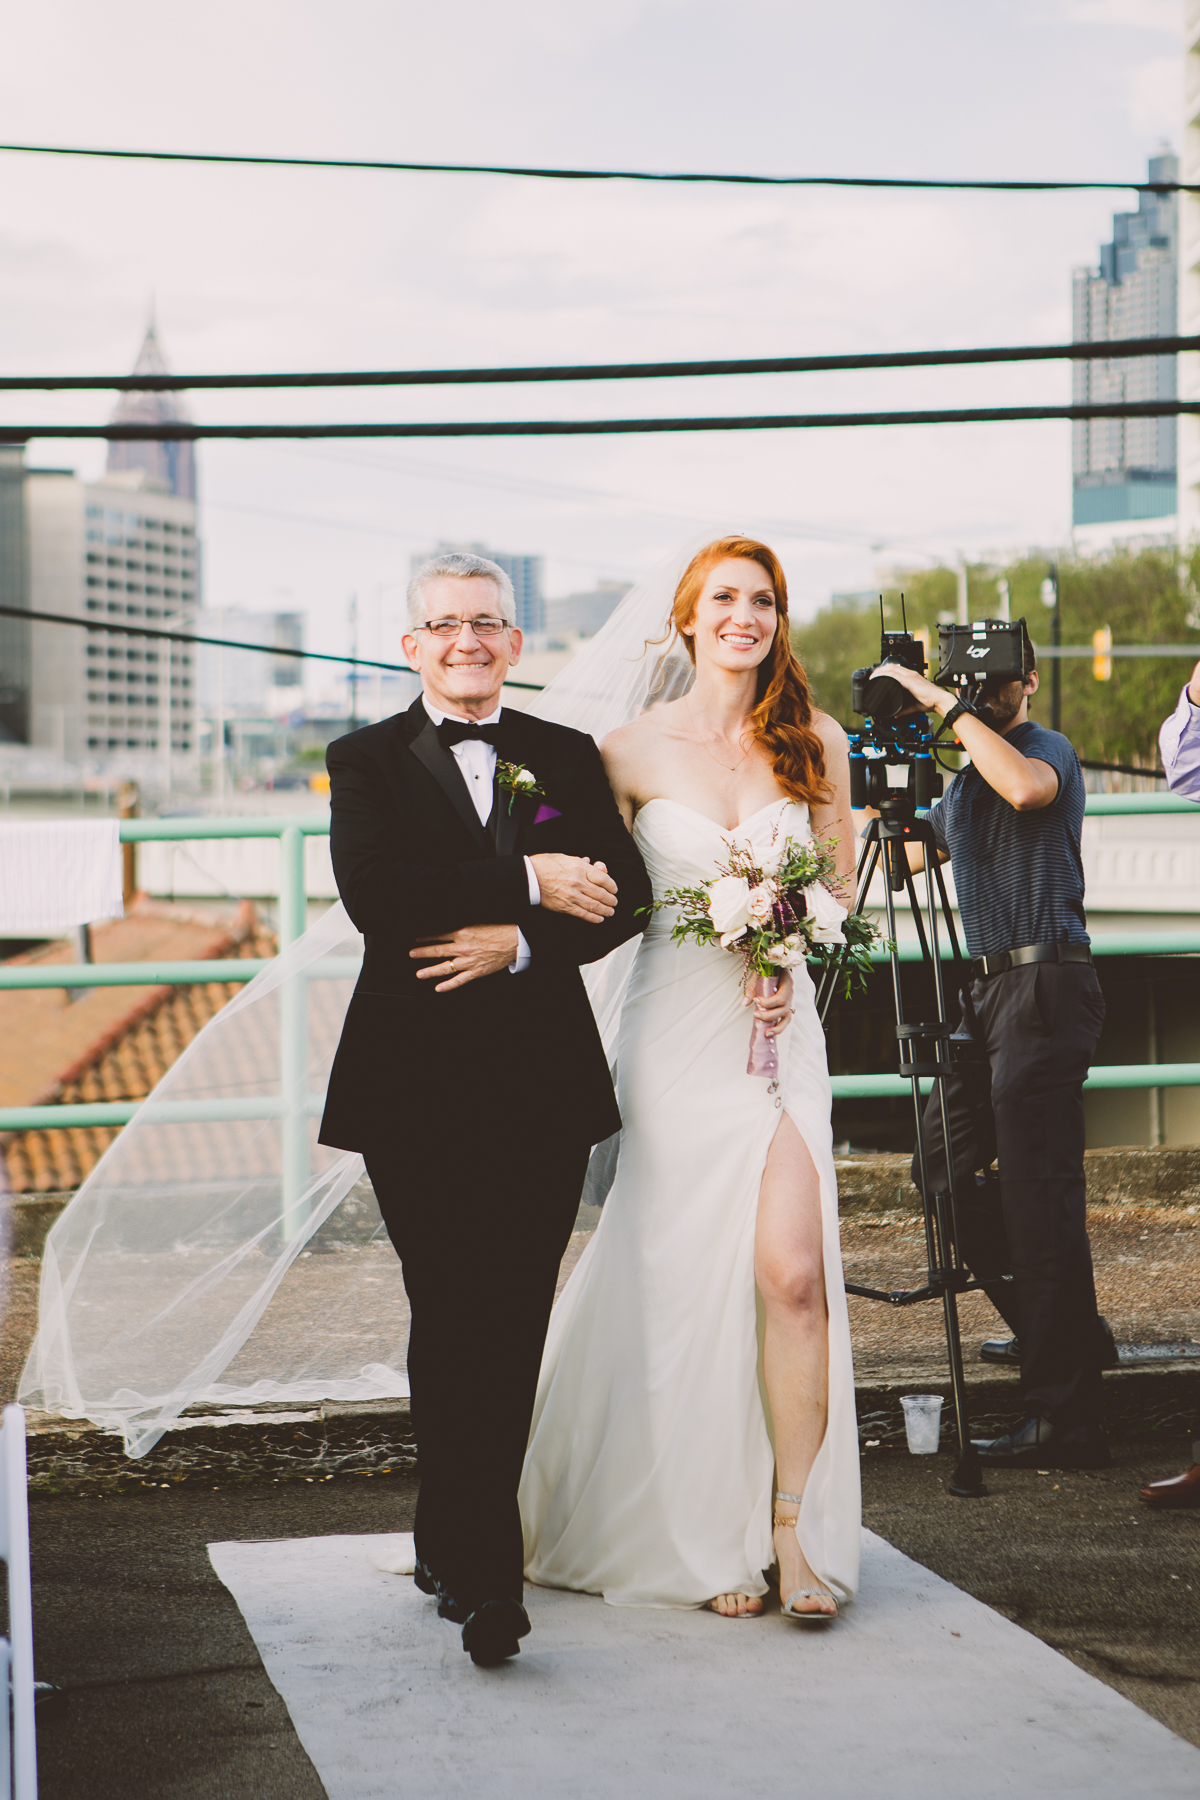 alex-carl-kelley-raye-atlanta-wedding-photographer-66.jpg